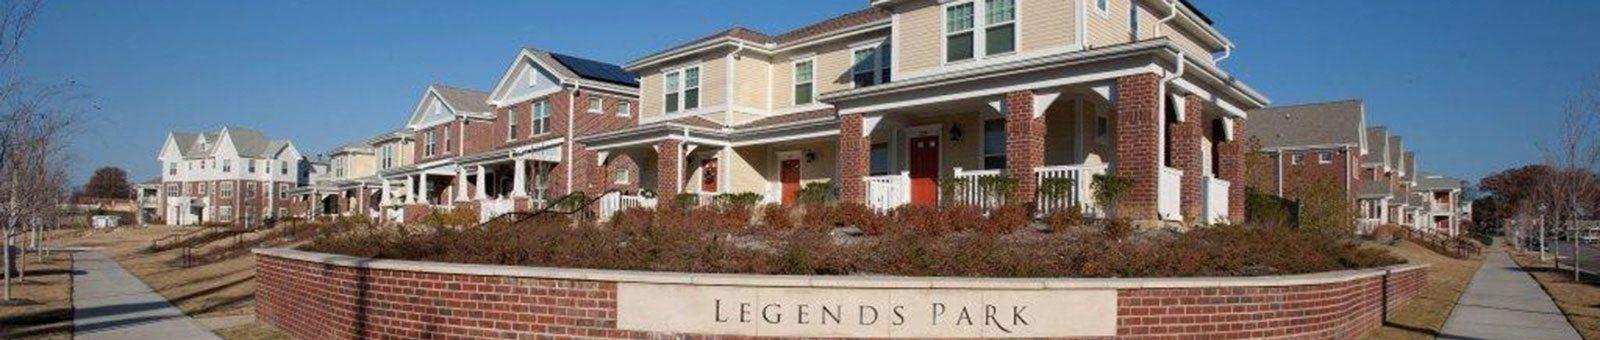 Apartment building and property signage-Legends Park Apartments, Memphis, TN